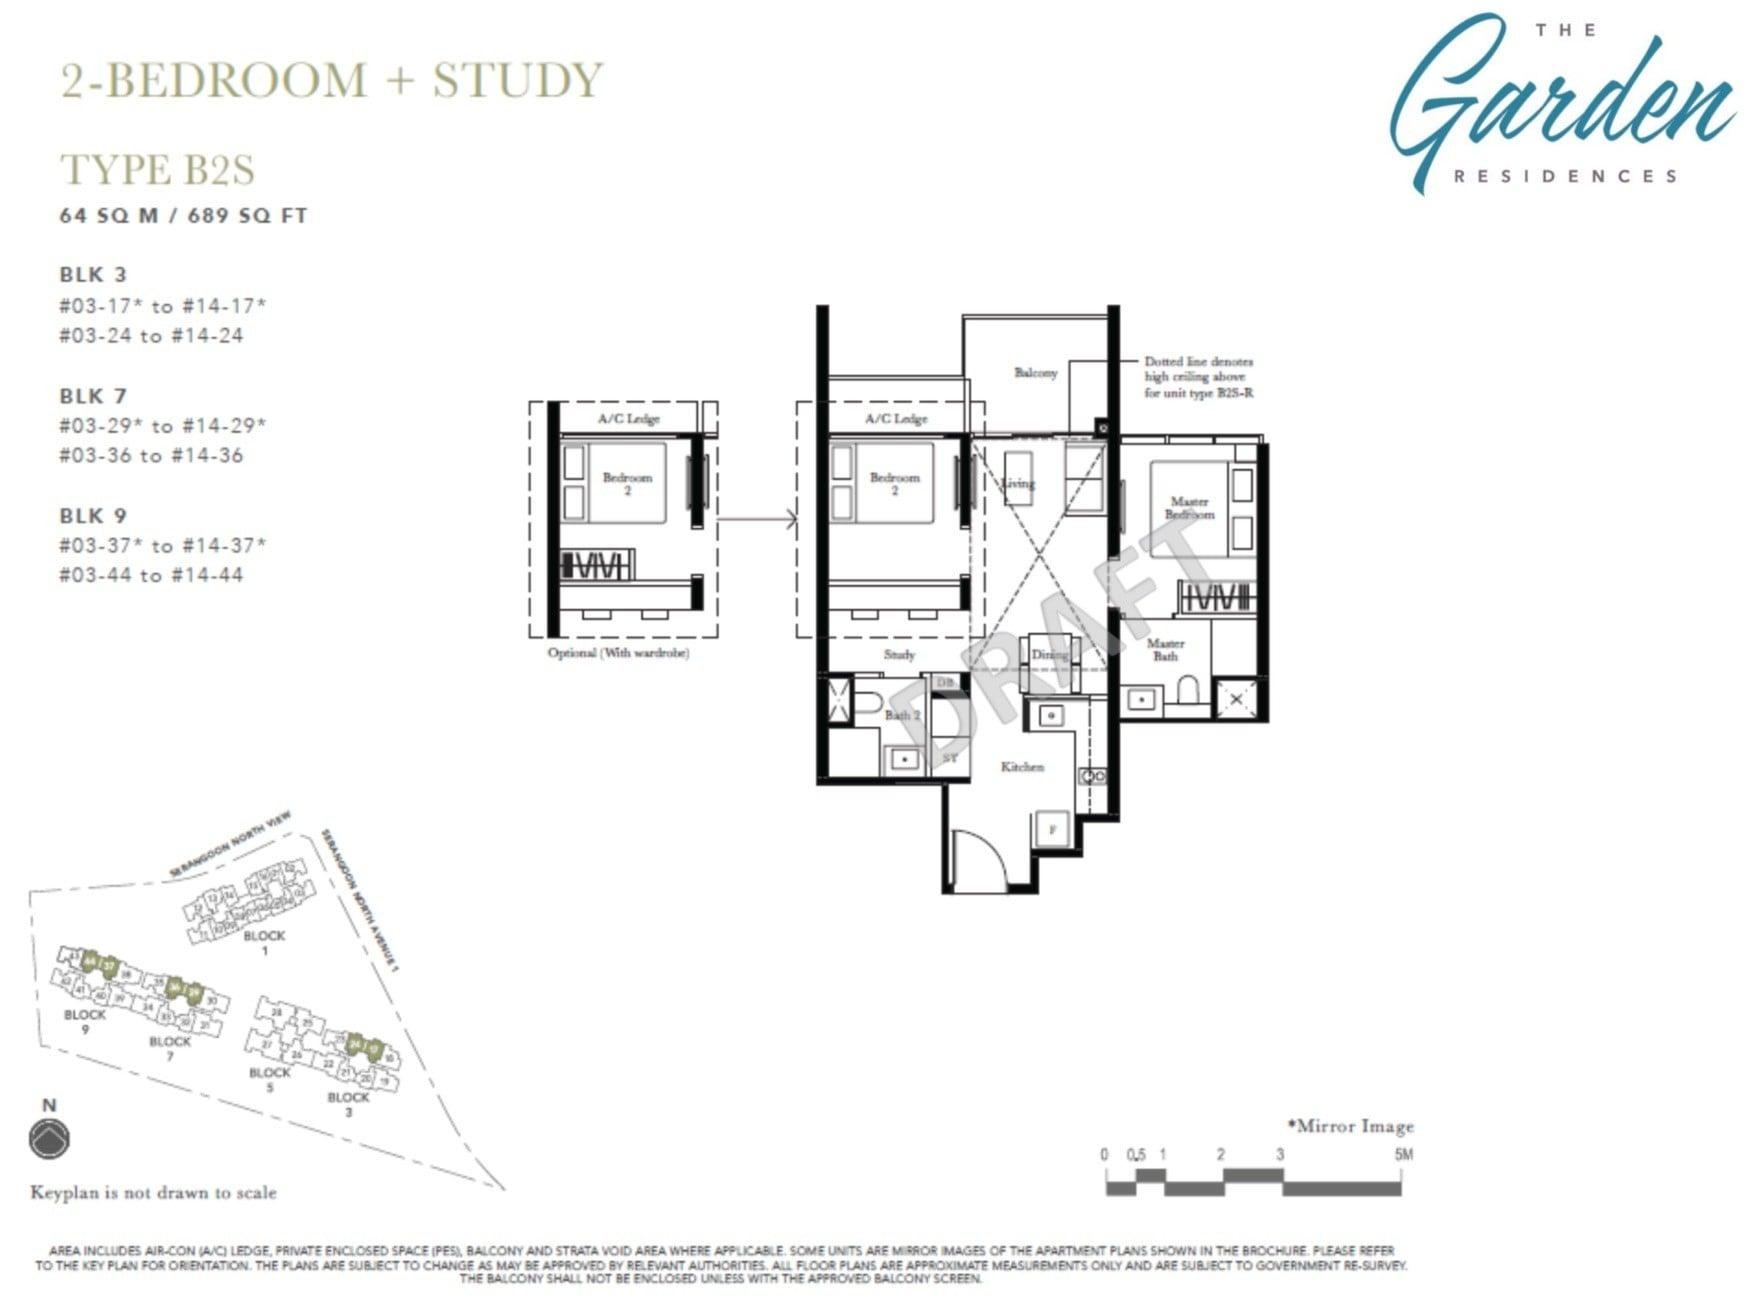 2br-the-garden-residences-floor-plan